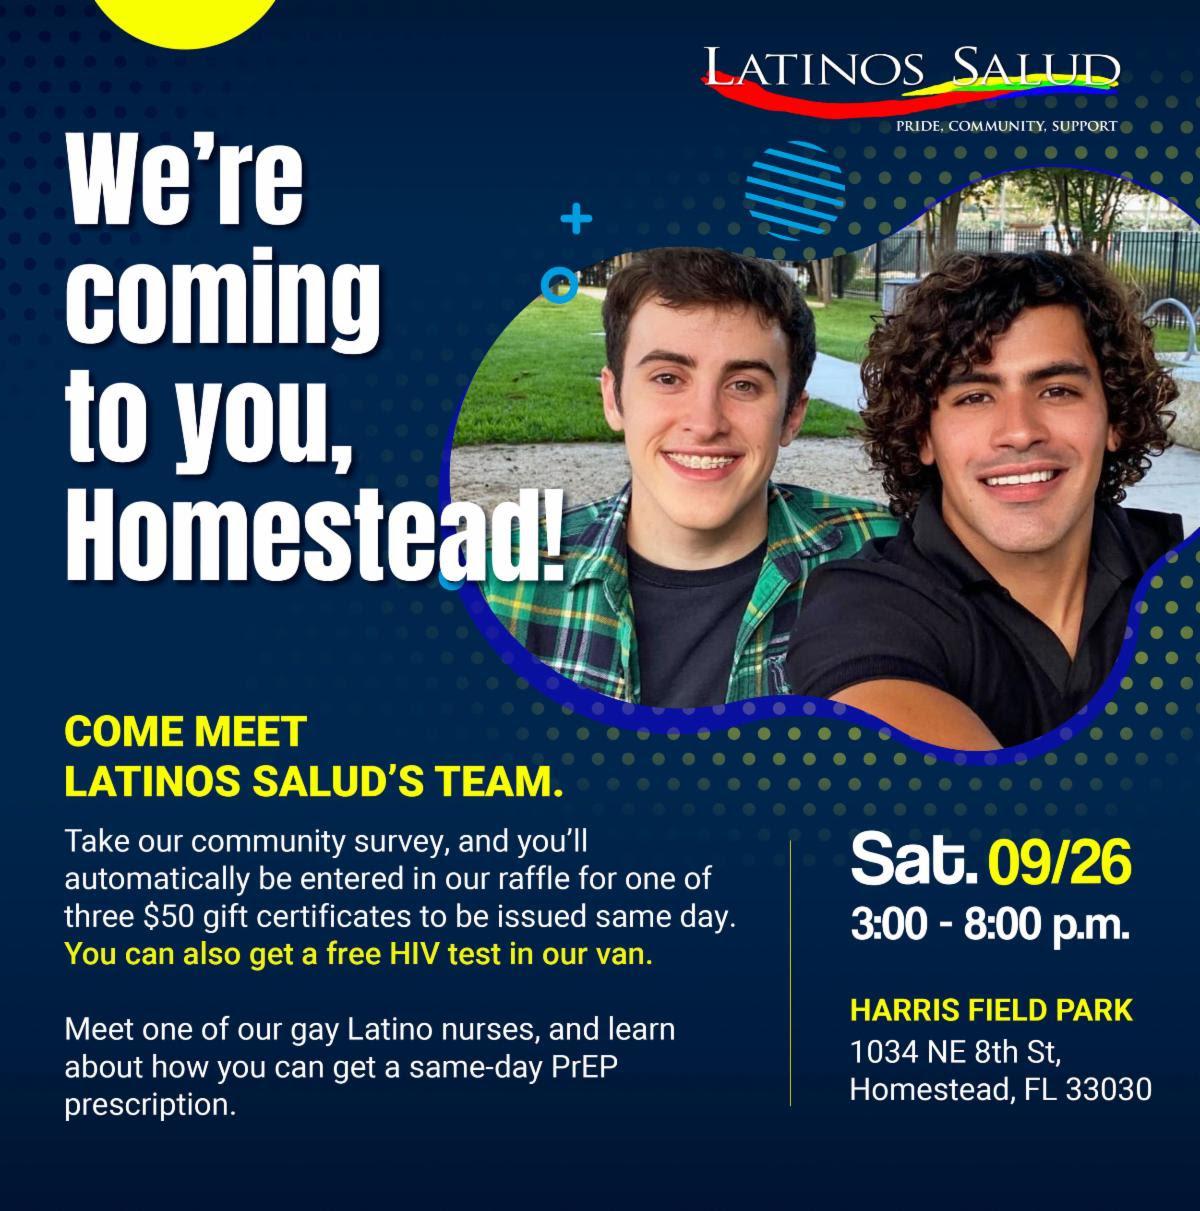 Latinos Salud – Comes to Homestead!